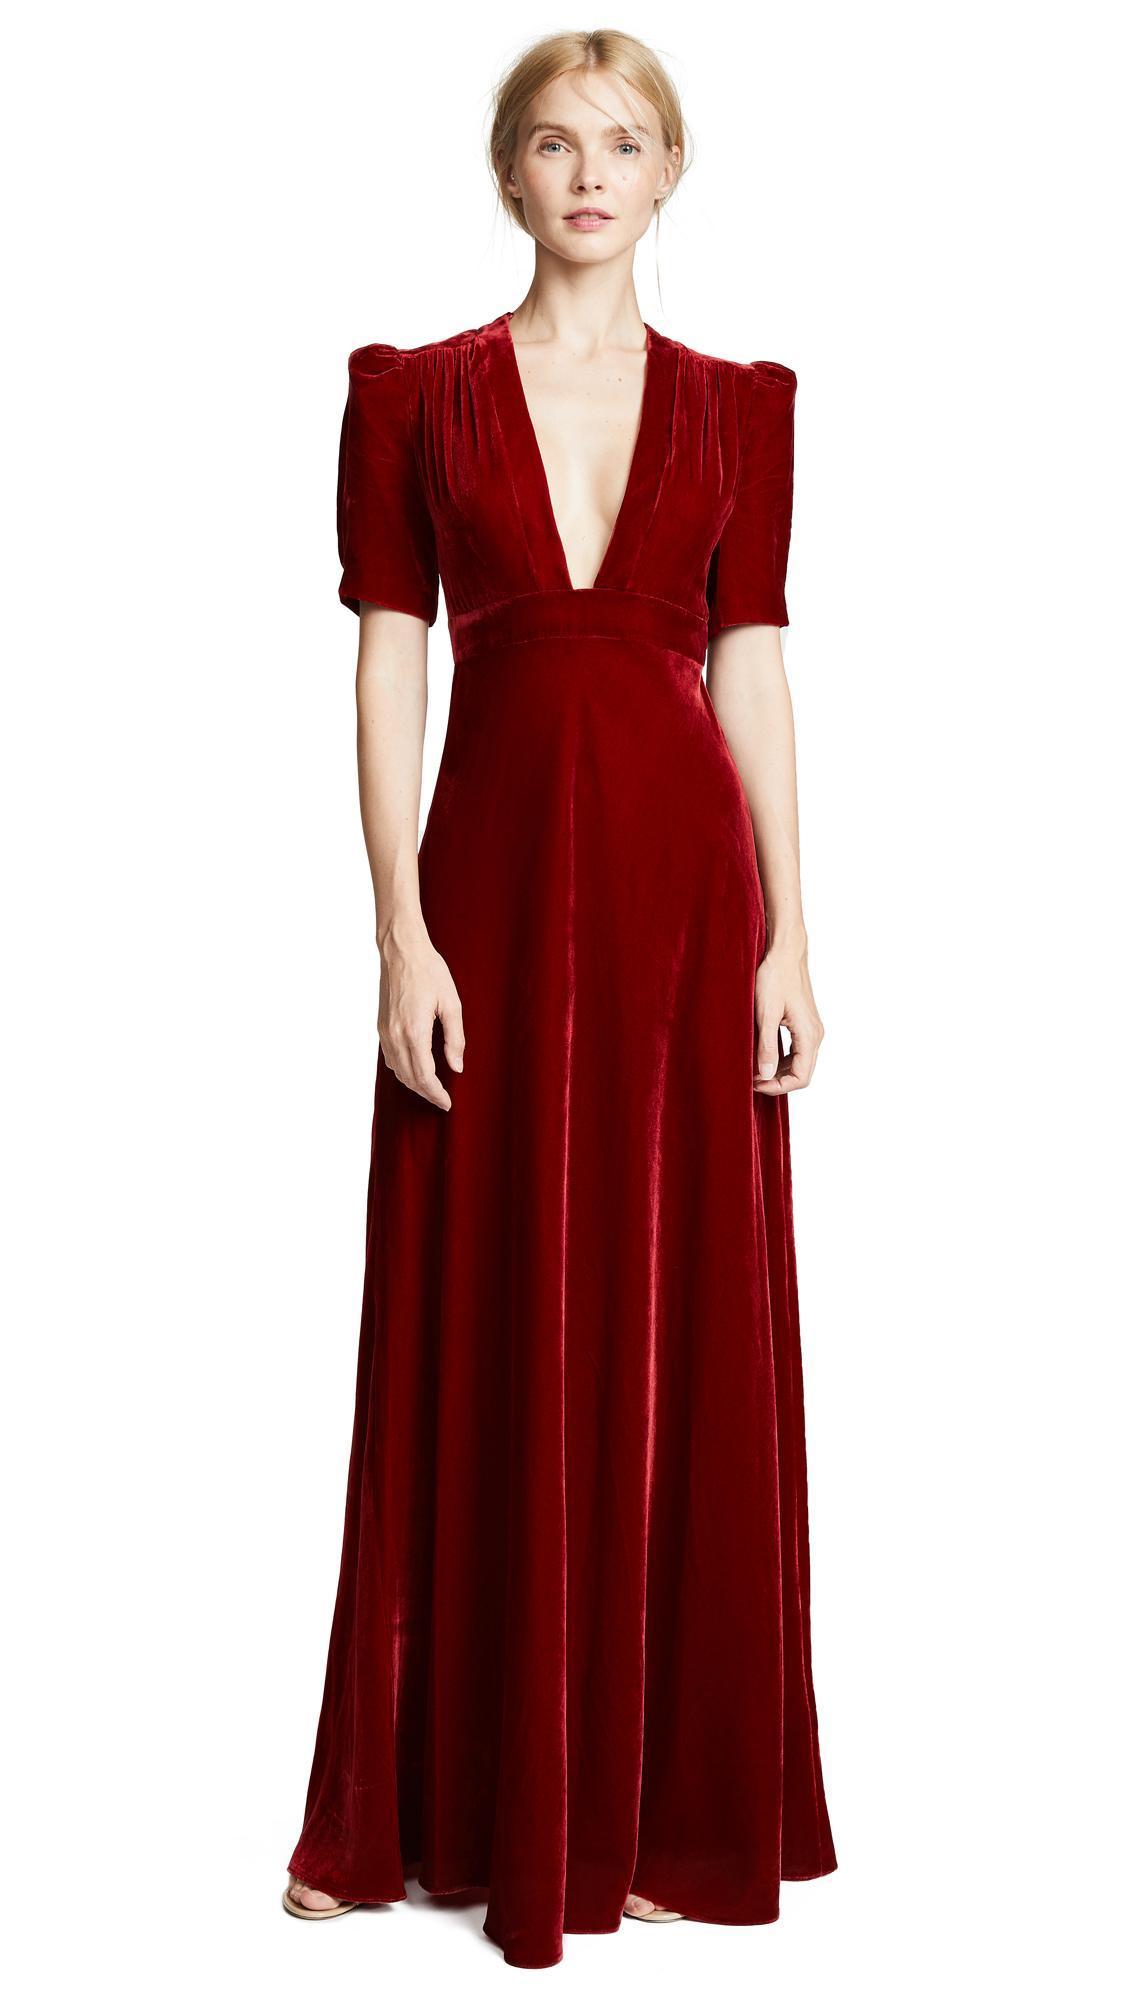 ff9ab810dc5b Jill Jill Stuart Plunging Velvet Gown In Ruby